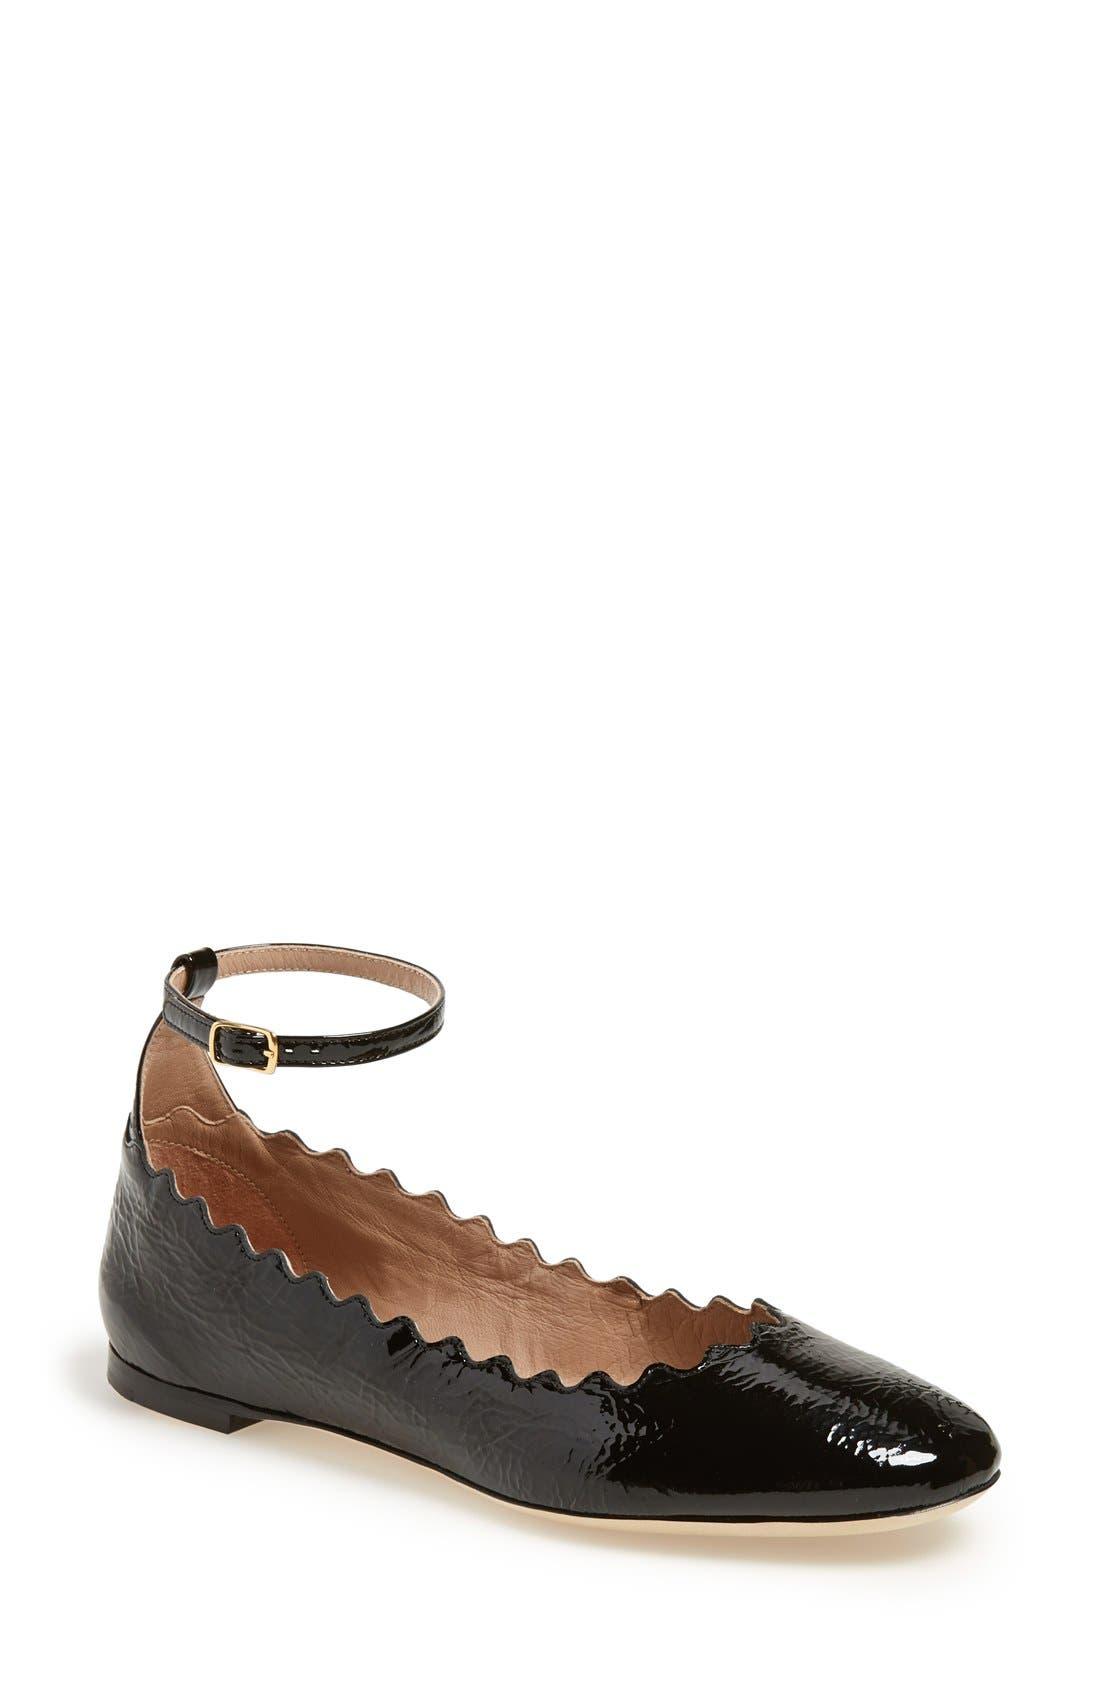 Alternate Image 1 Selected - Chloé 'Laurent' Ankle Strap Flat (Women)